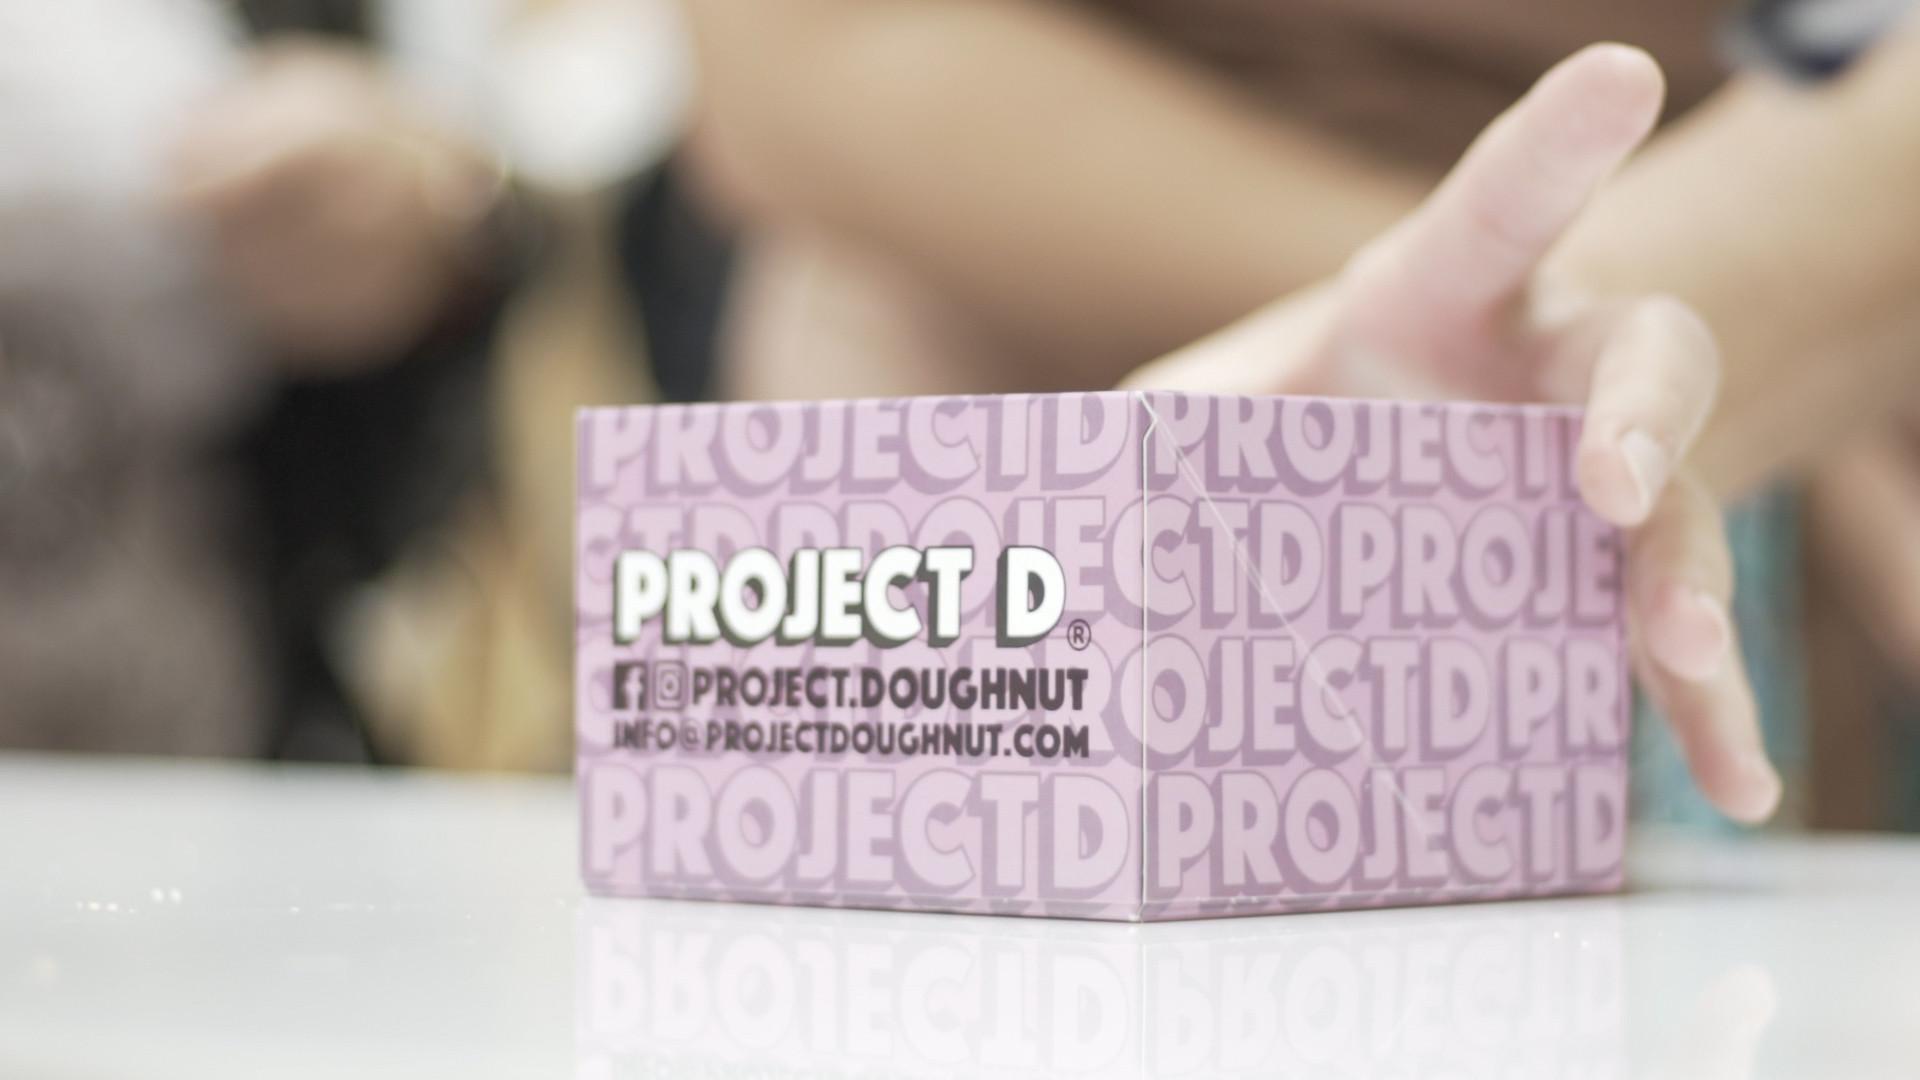 Project D